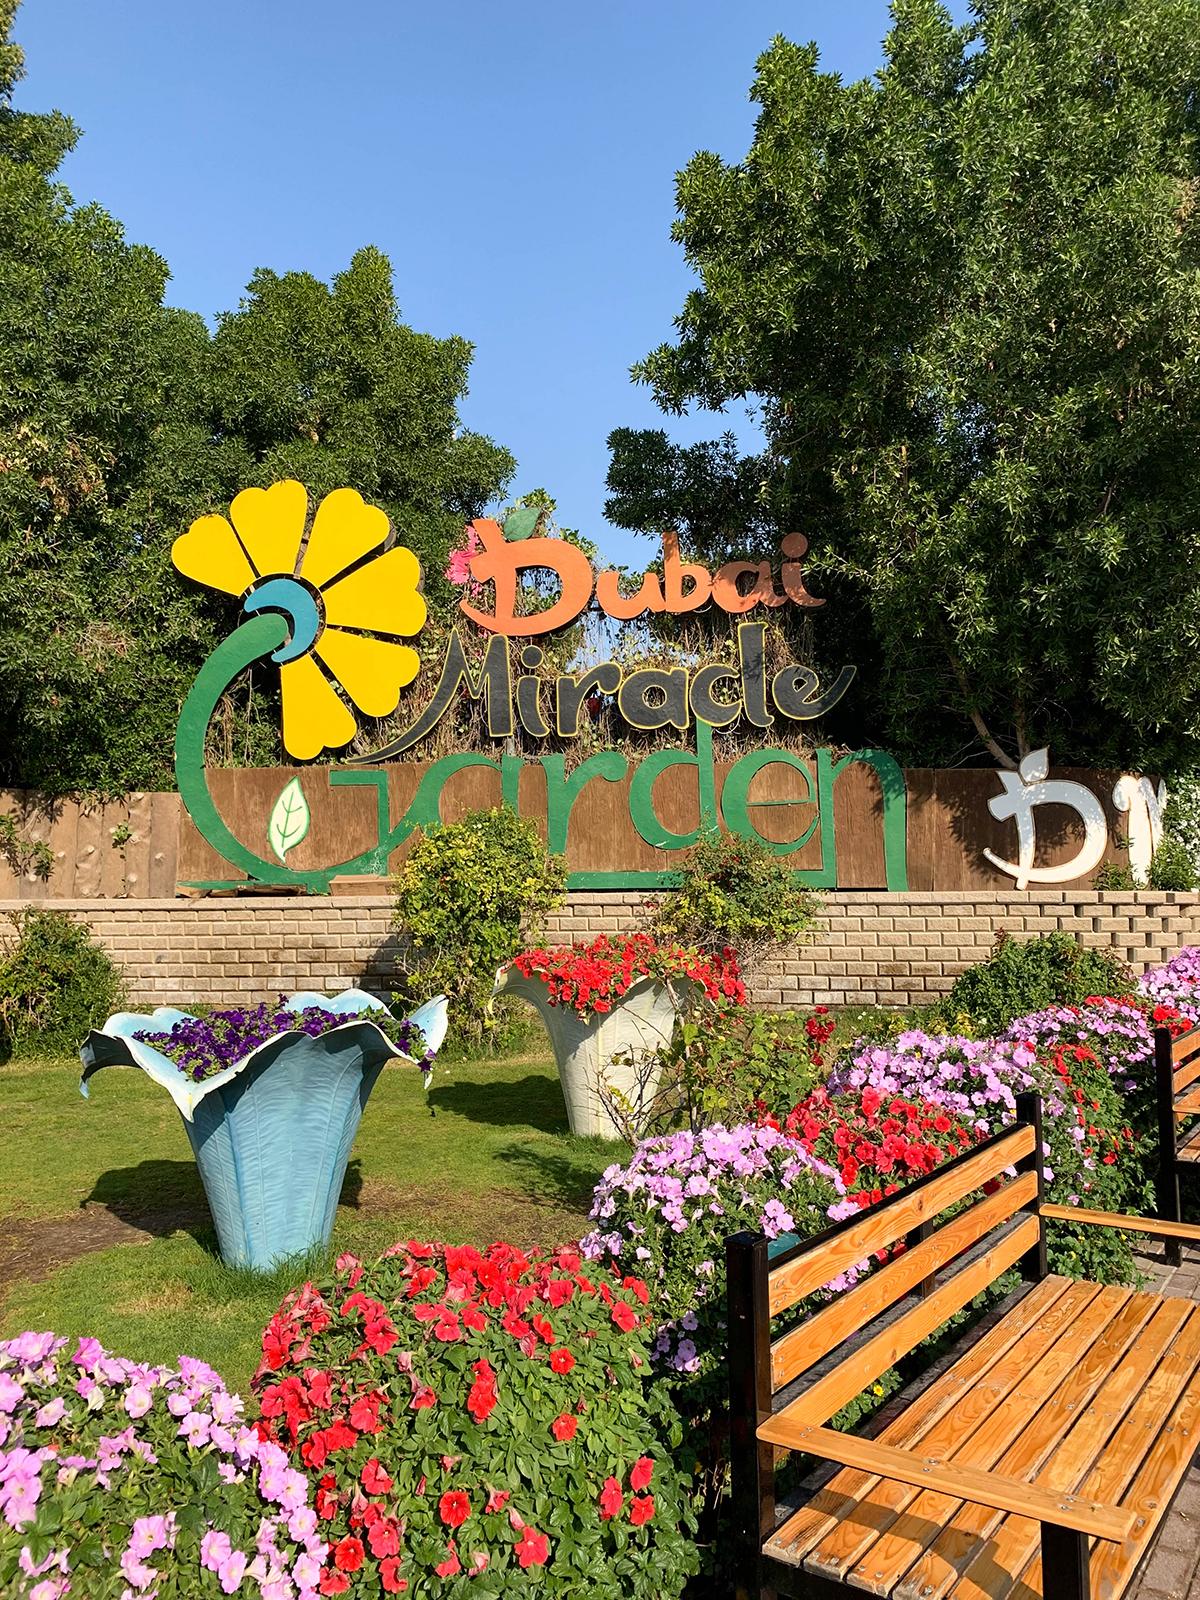 Katies Bliss Dubai Travel Guide